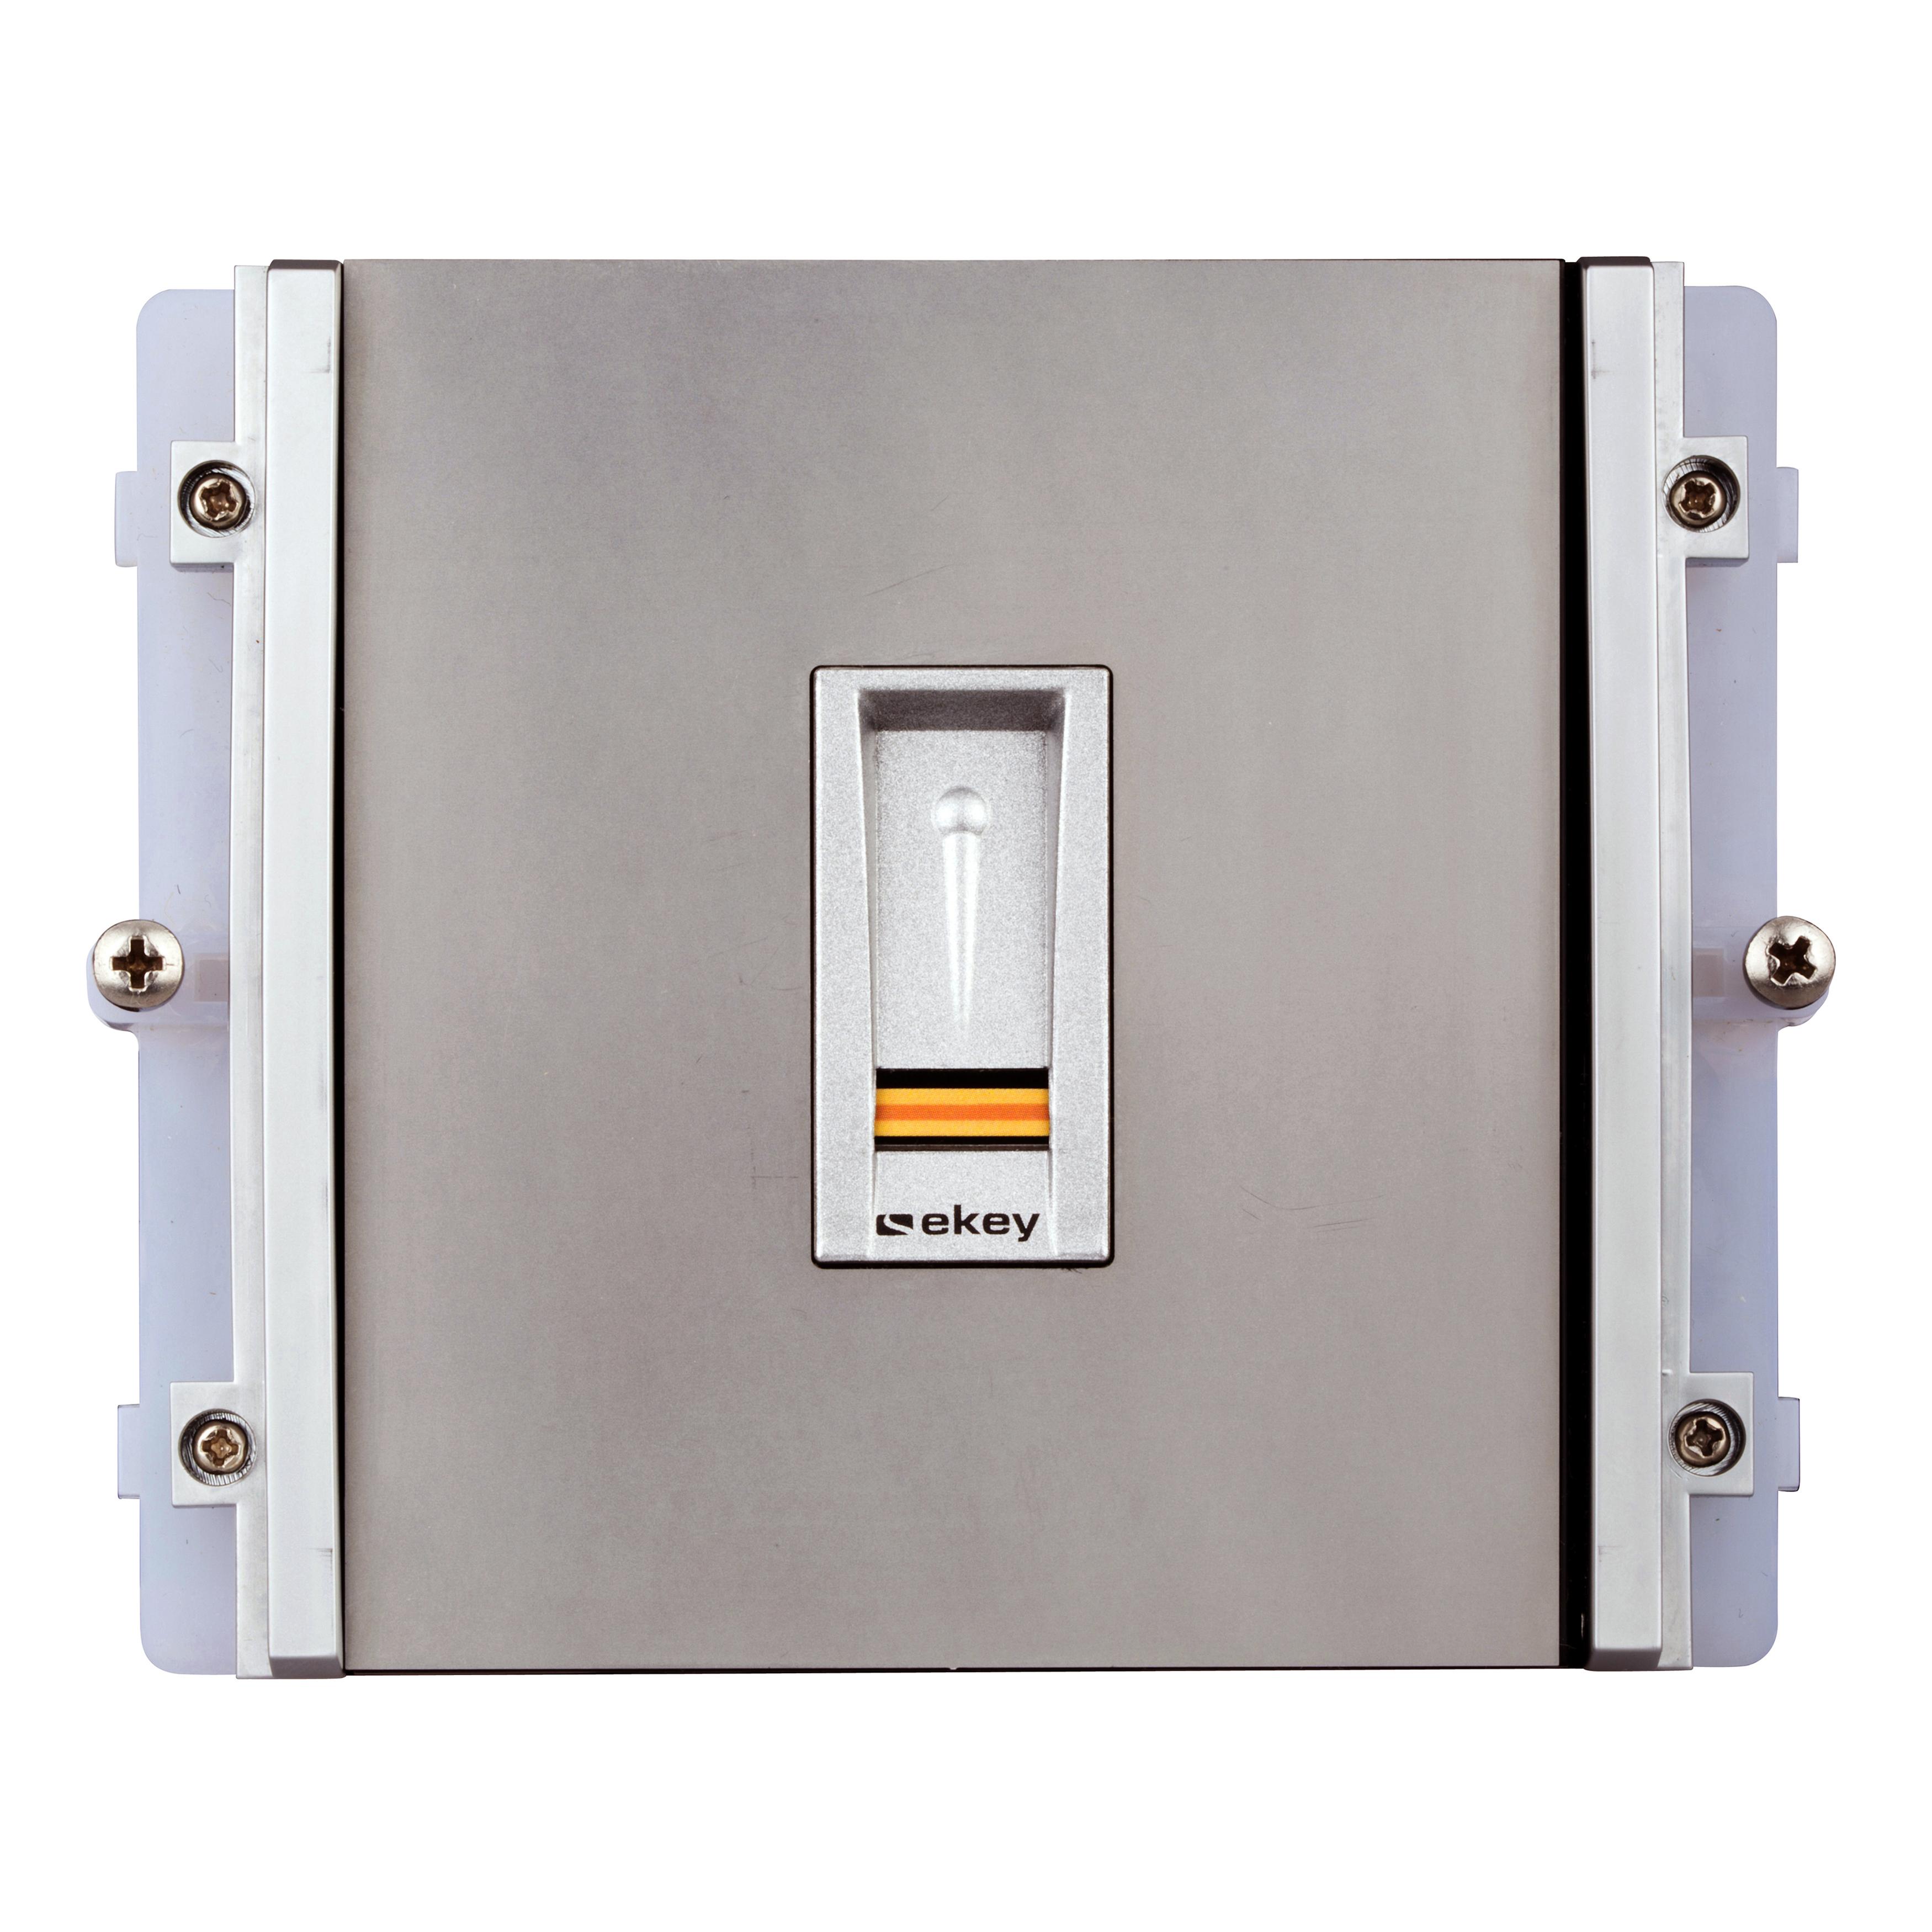 1 Stk EKEY Fingerscanner-Modul für IKALL METAL SP3334M-EK